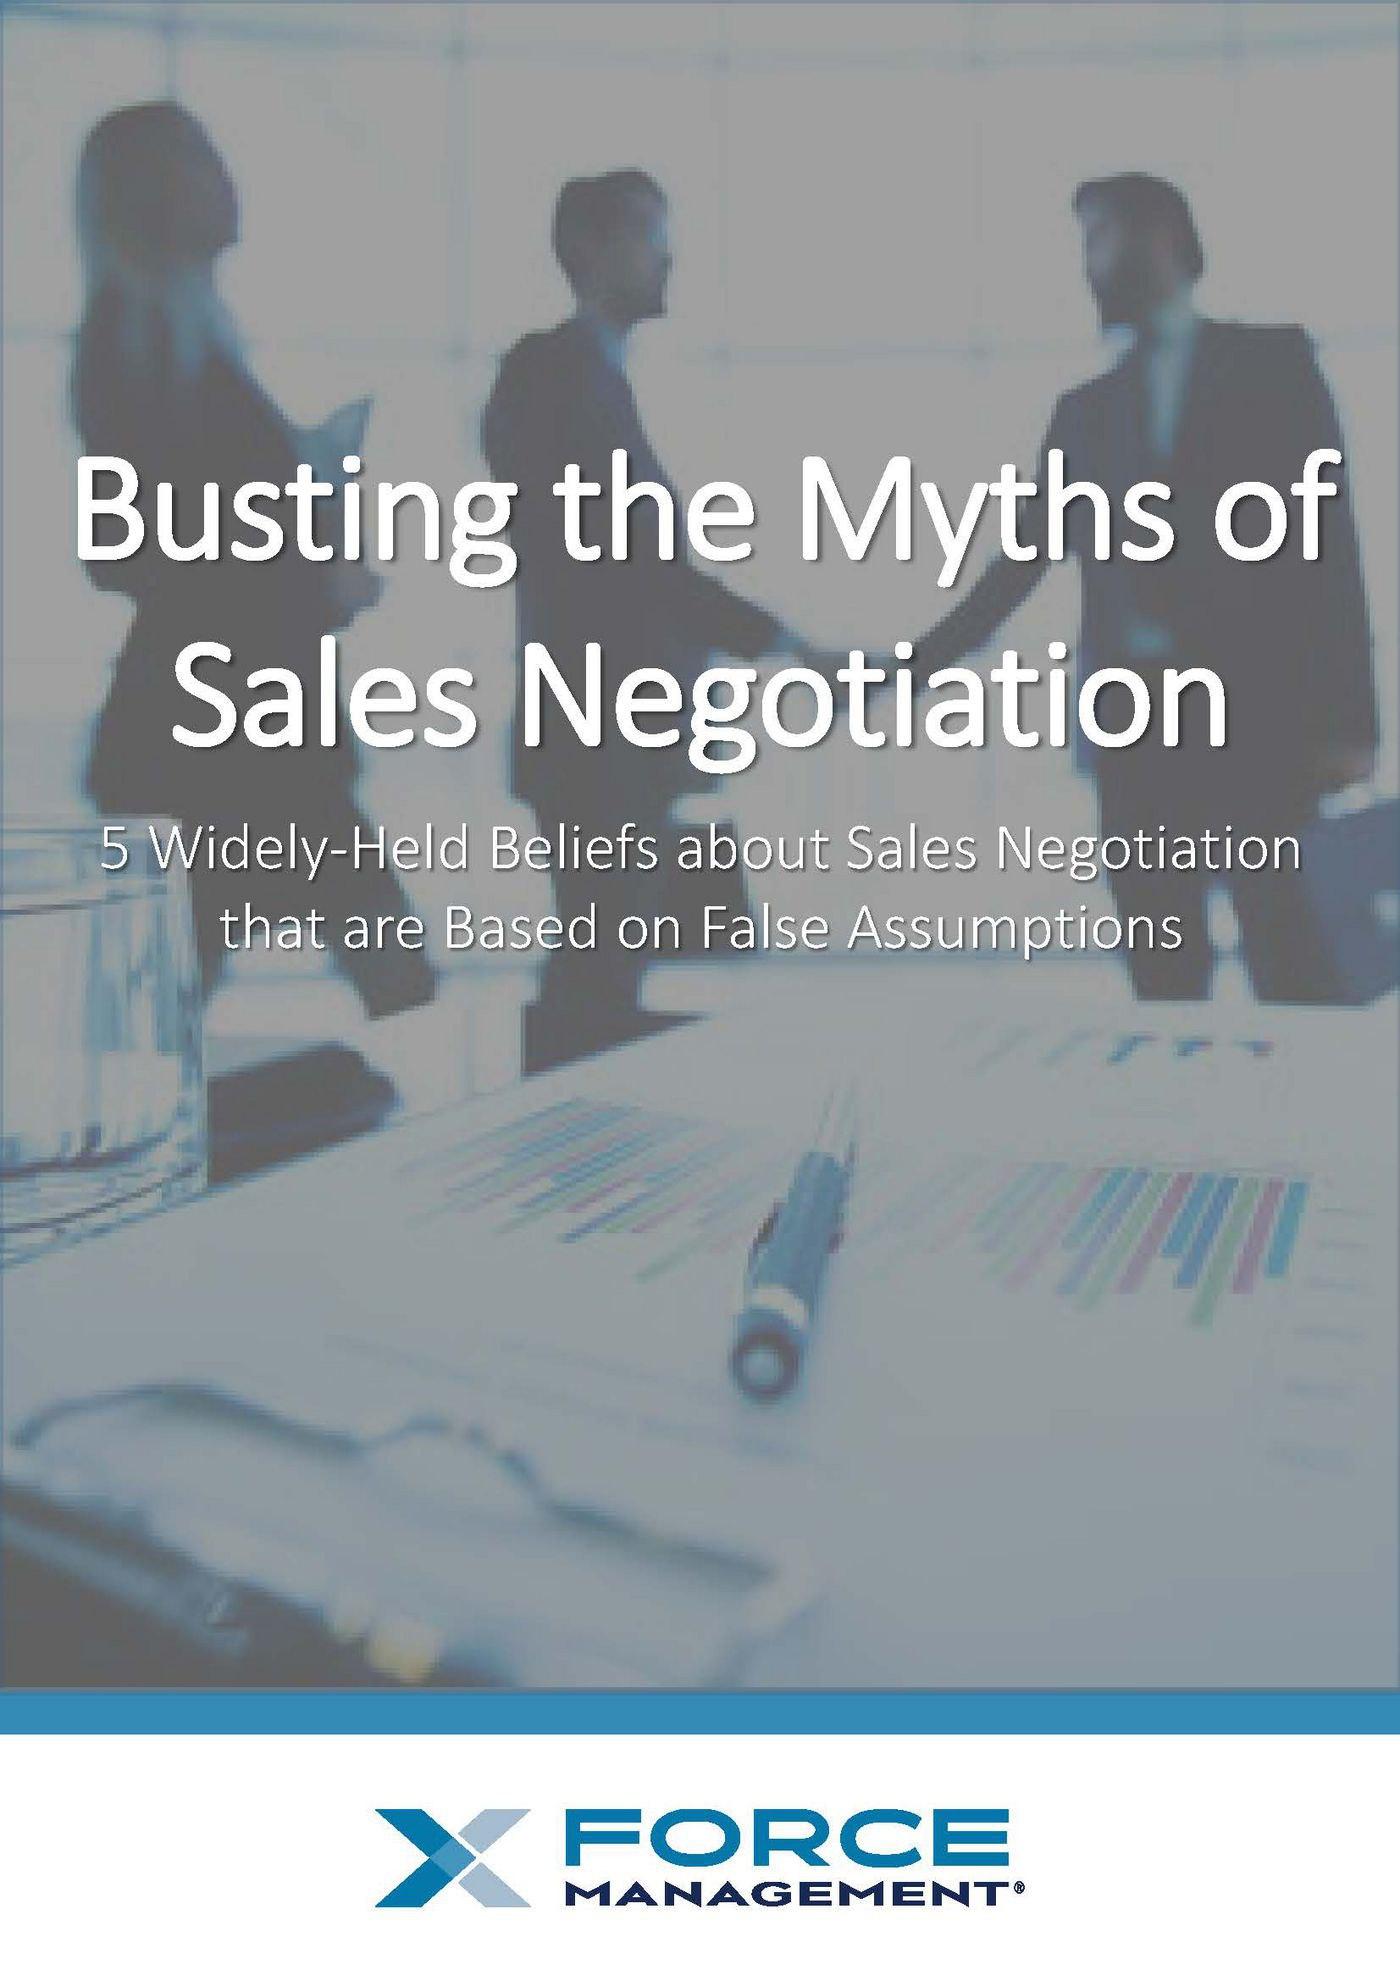 VN - Busting the Myths of Sales Negotiation eBook IMAGE.jpg